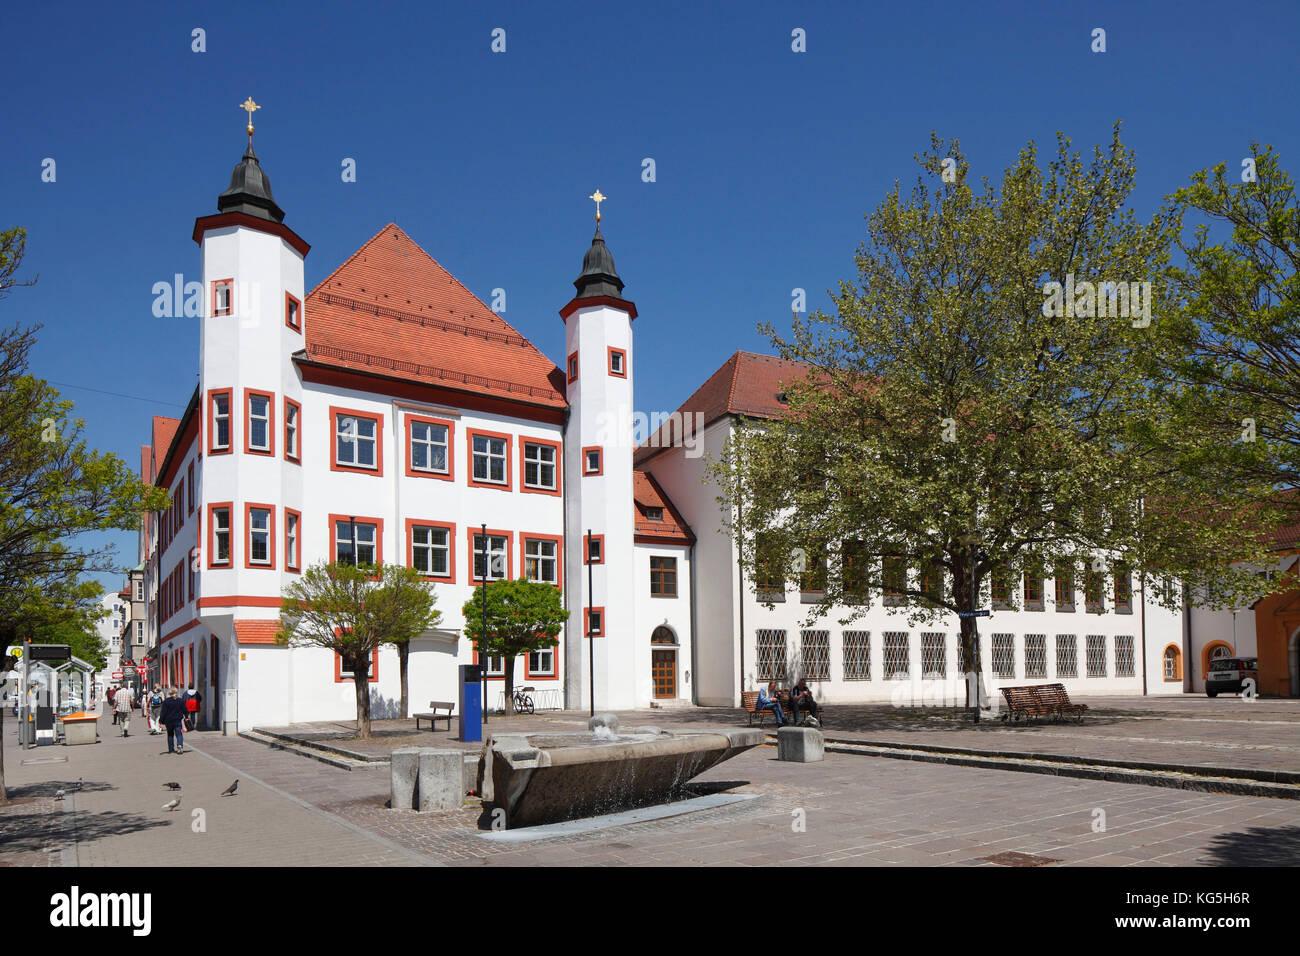 Amtsgericht (court), Franziskanerplatz (square), Ingolstadt, Upper Bavaria, Bavaria, Germany, Europe Stock Photo